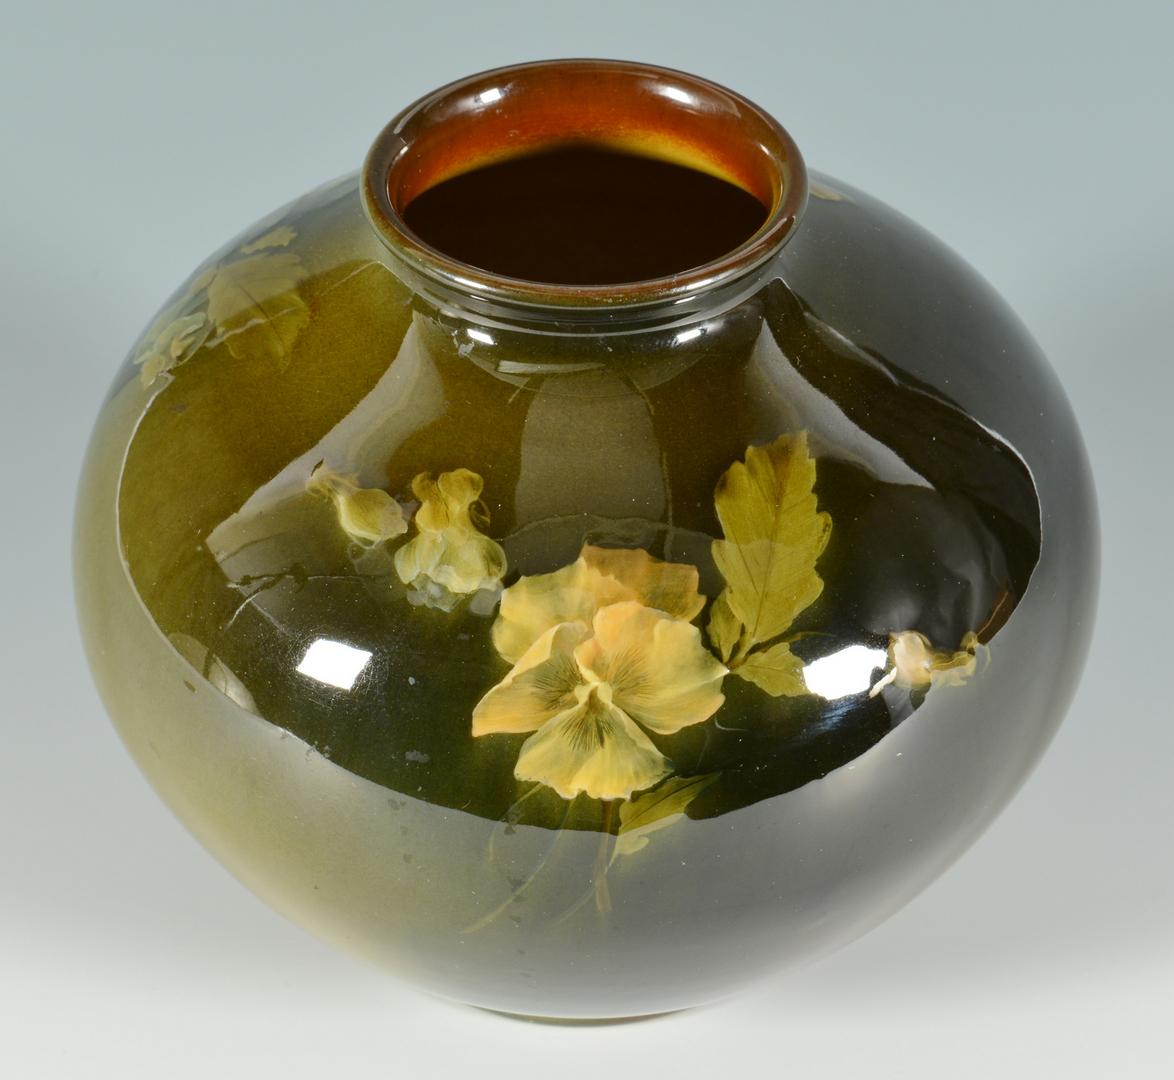 Lot 3088263: Early Rookwood Vase, signed O. G. Reed